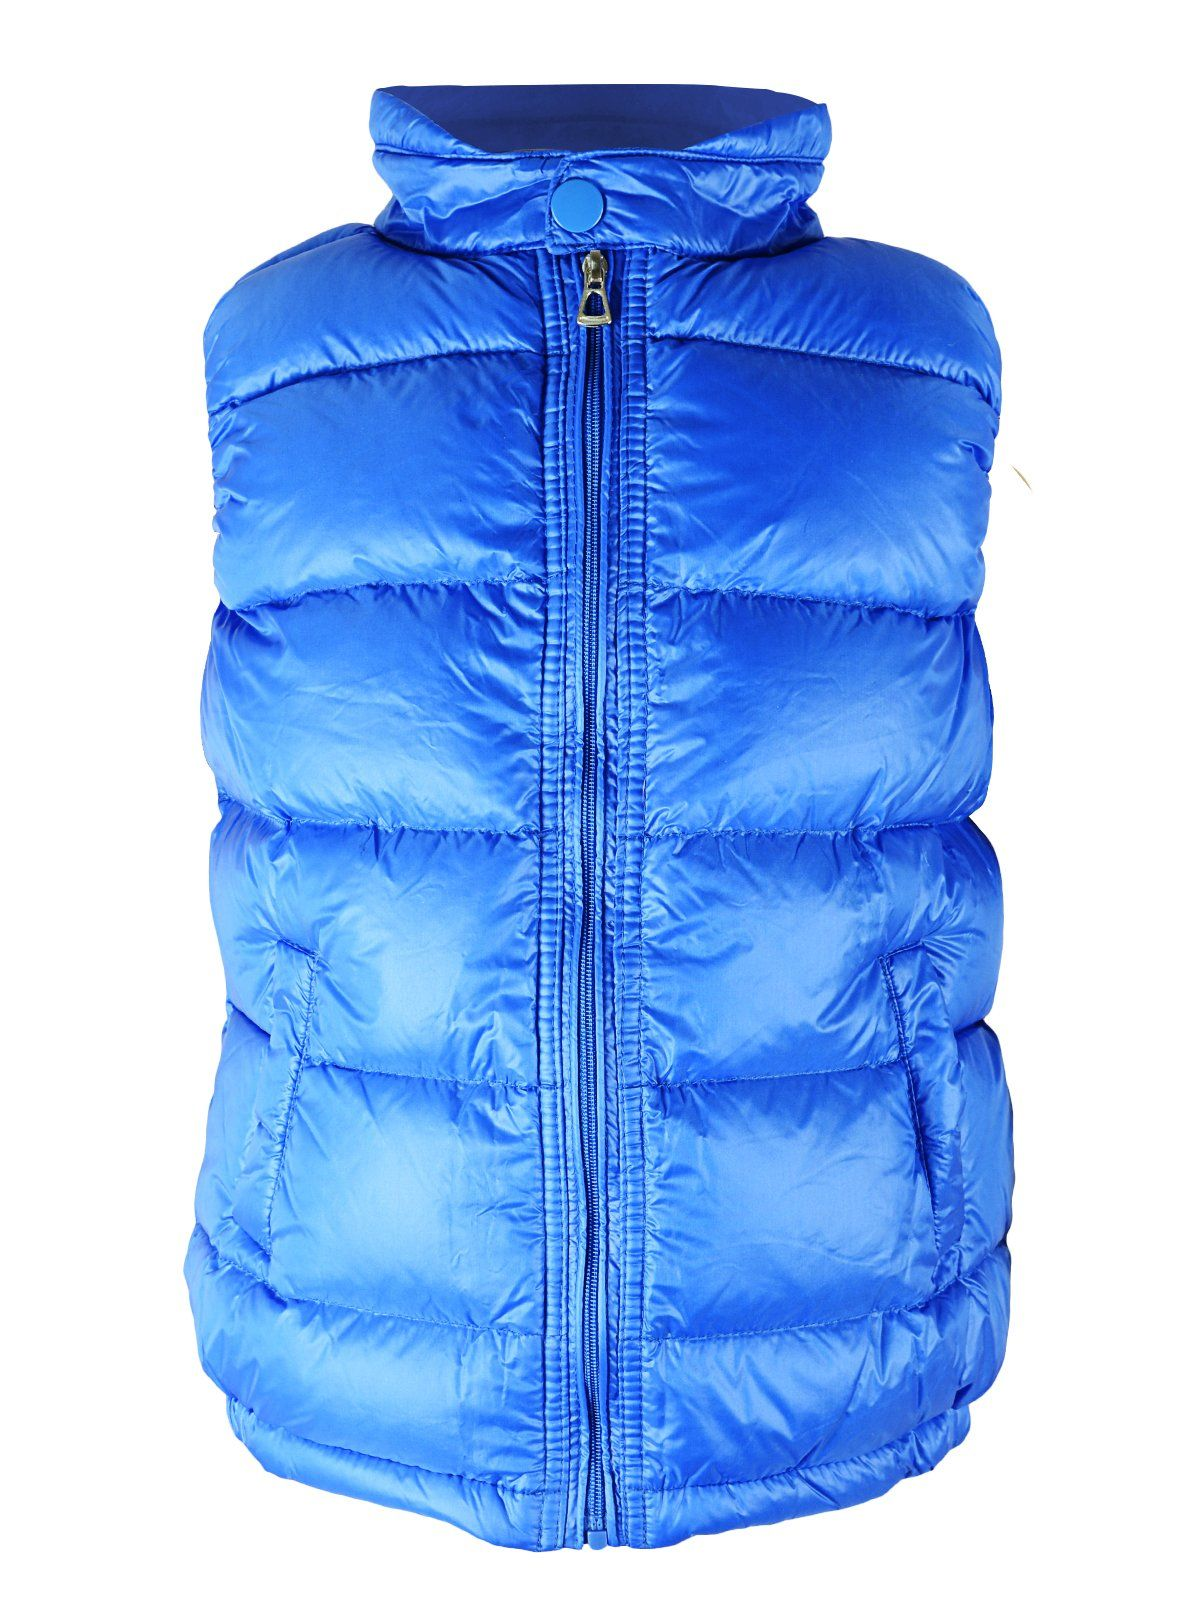 Kids Boys Girls Stand Collar Warm Cotton Down Vest Jacket Puffer Long Waistcoat